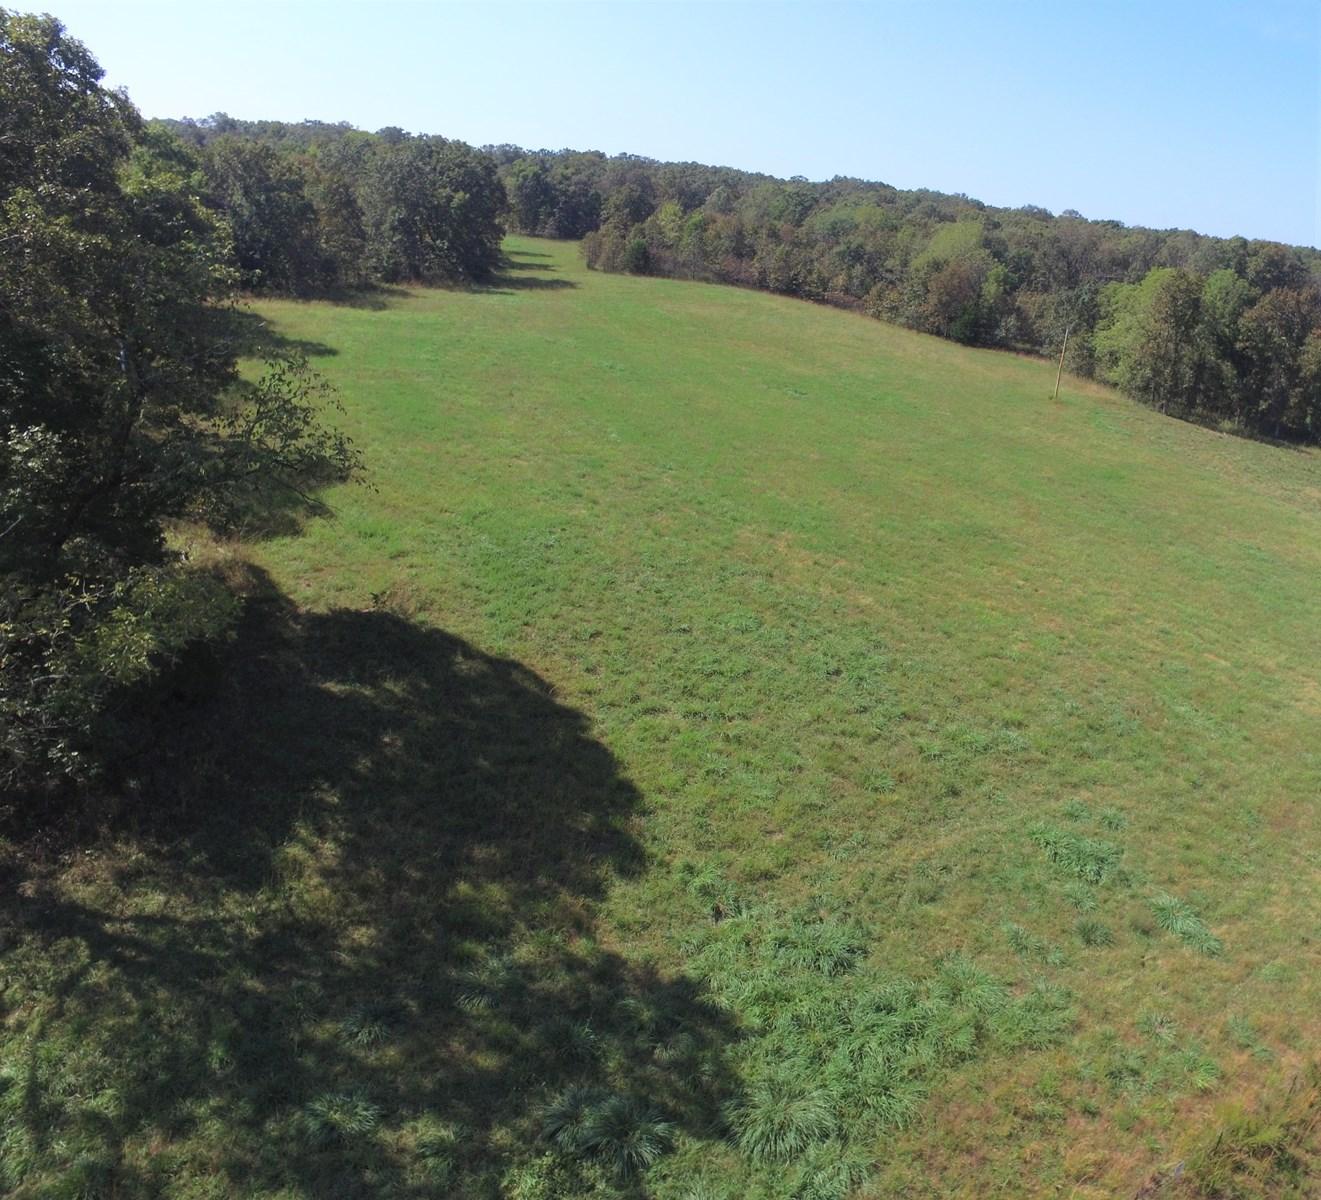 Land for Sale Missouri 2126 ac+/- Benton County